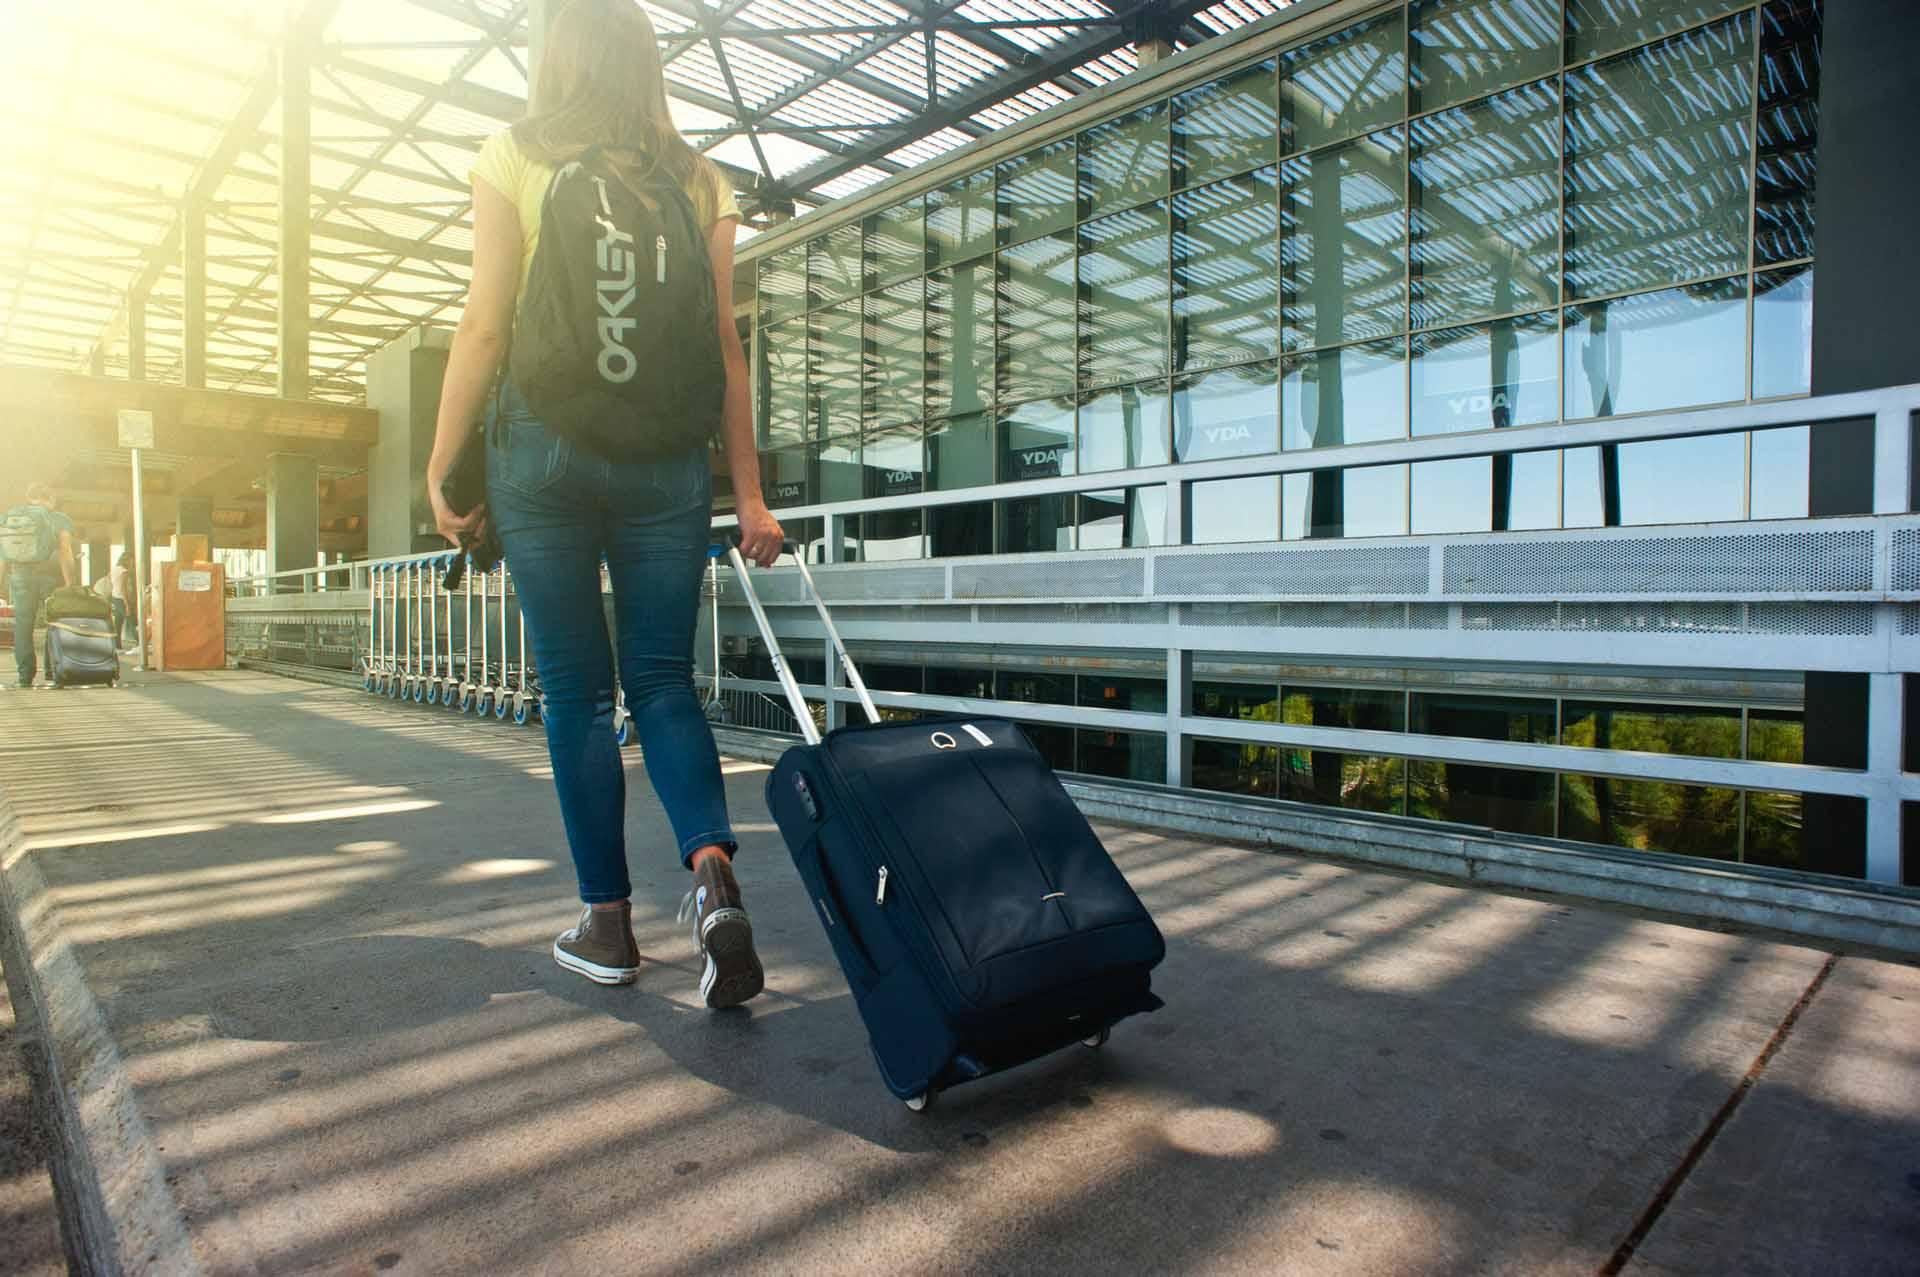 USA travelers